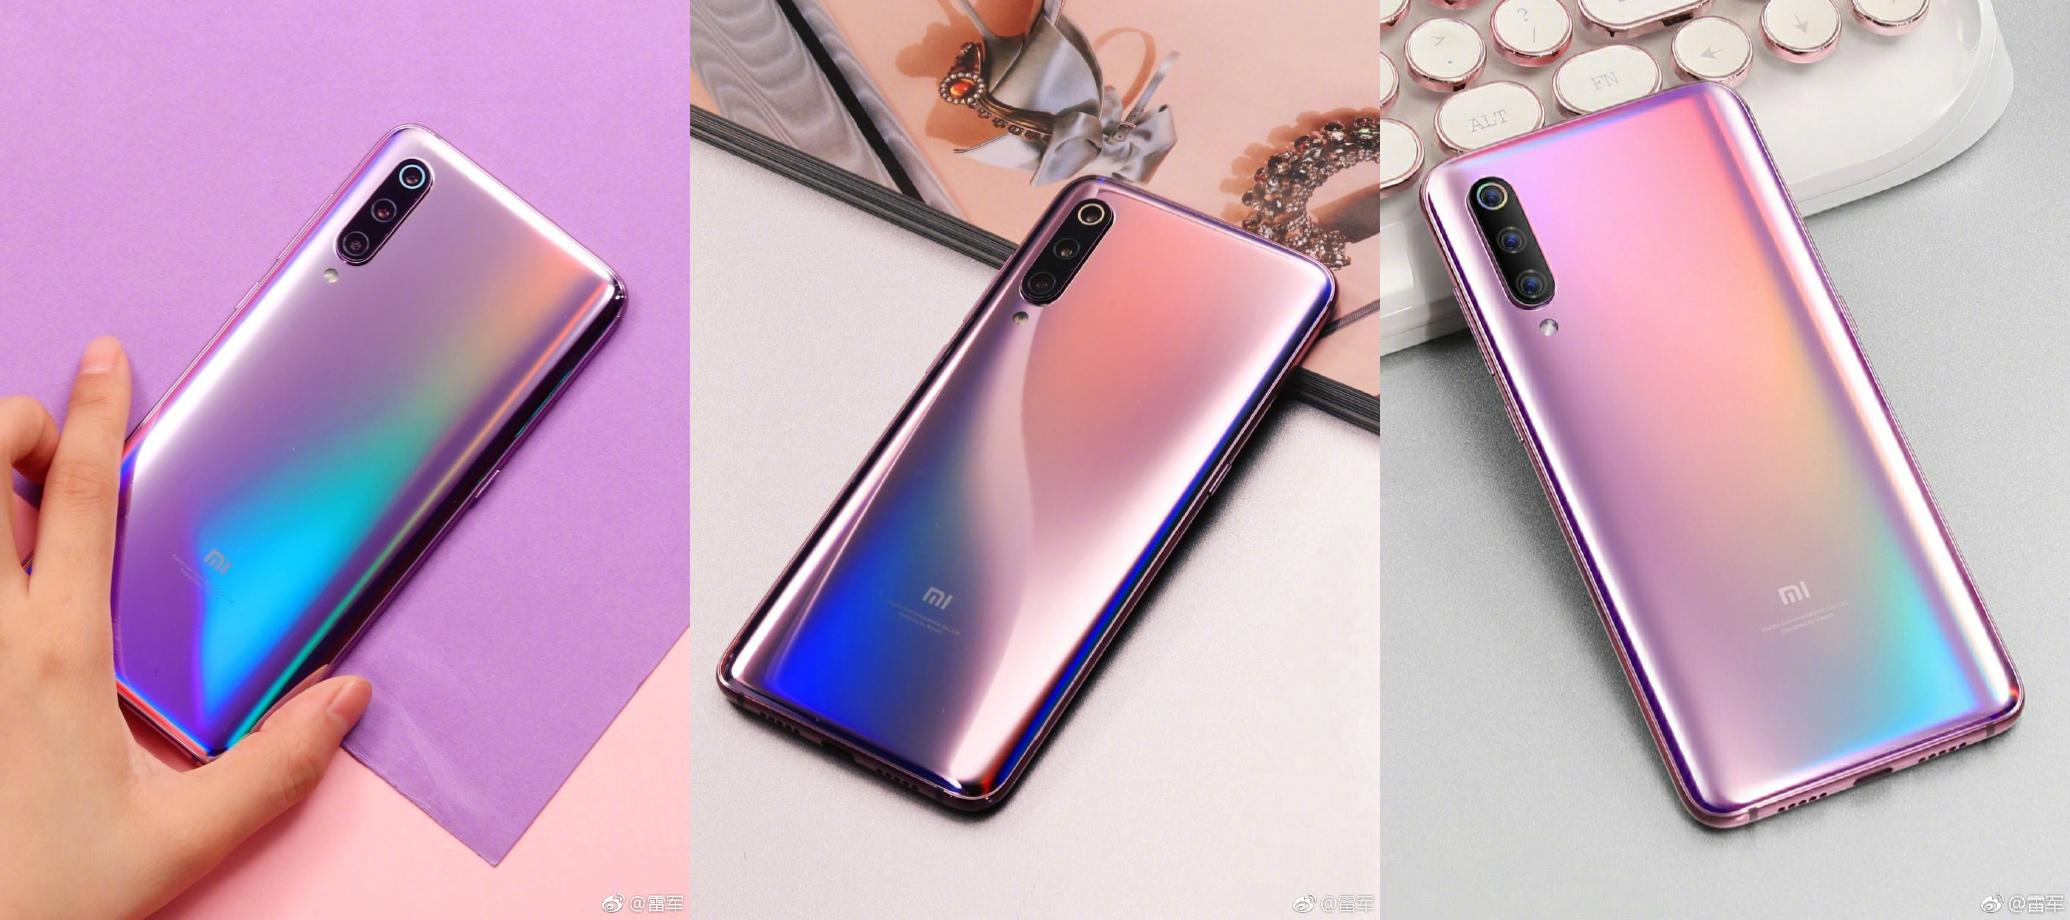 Le Xiaomi Mi 9 sera un smartphone premium et complet